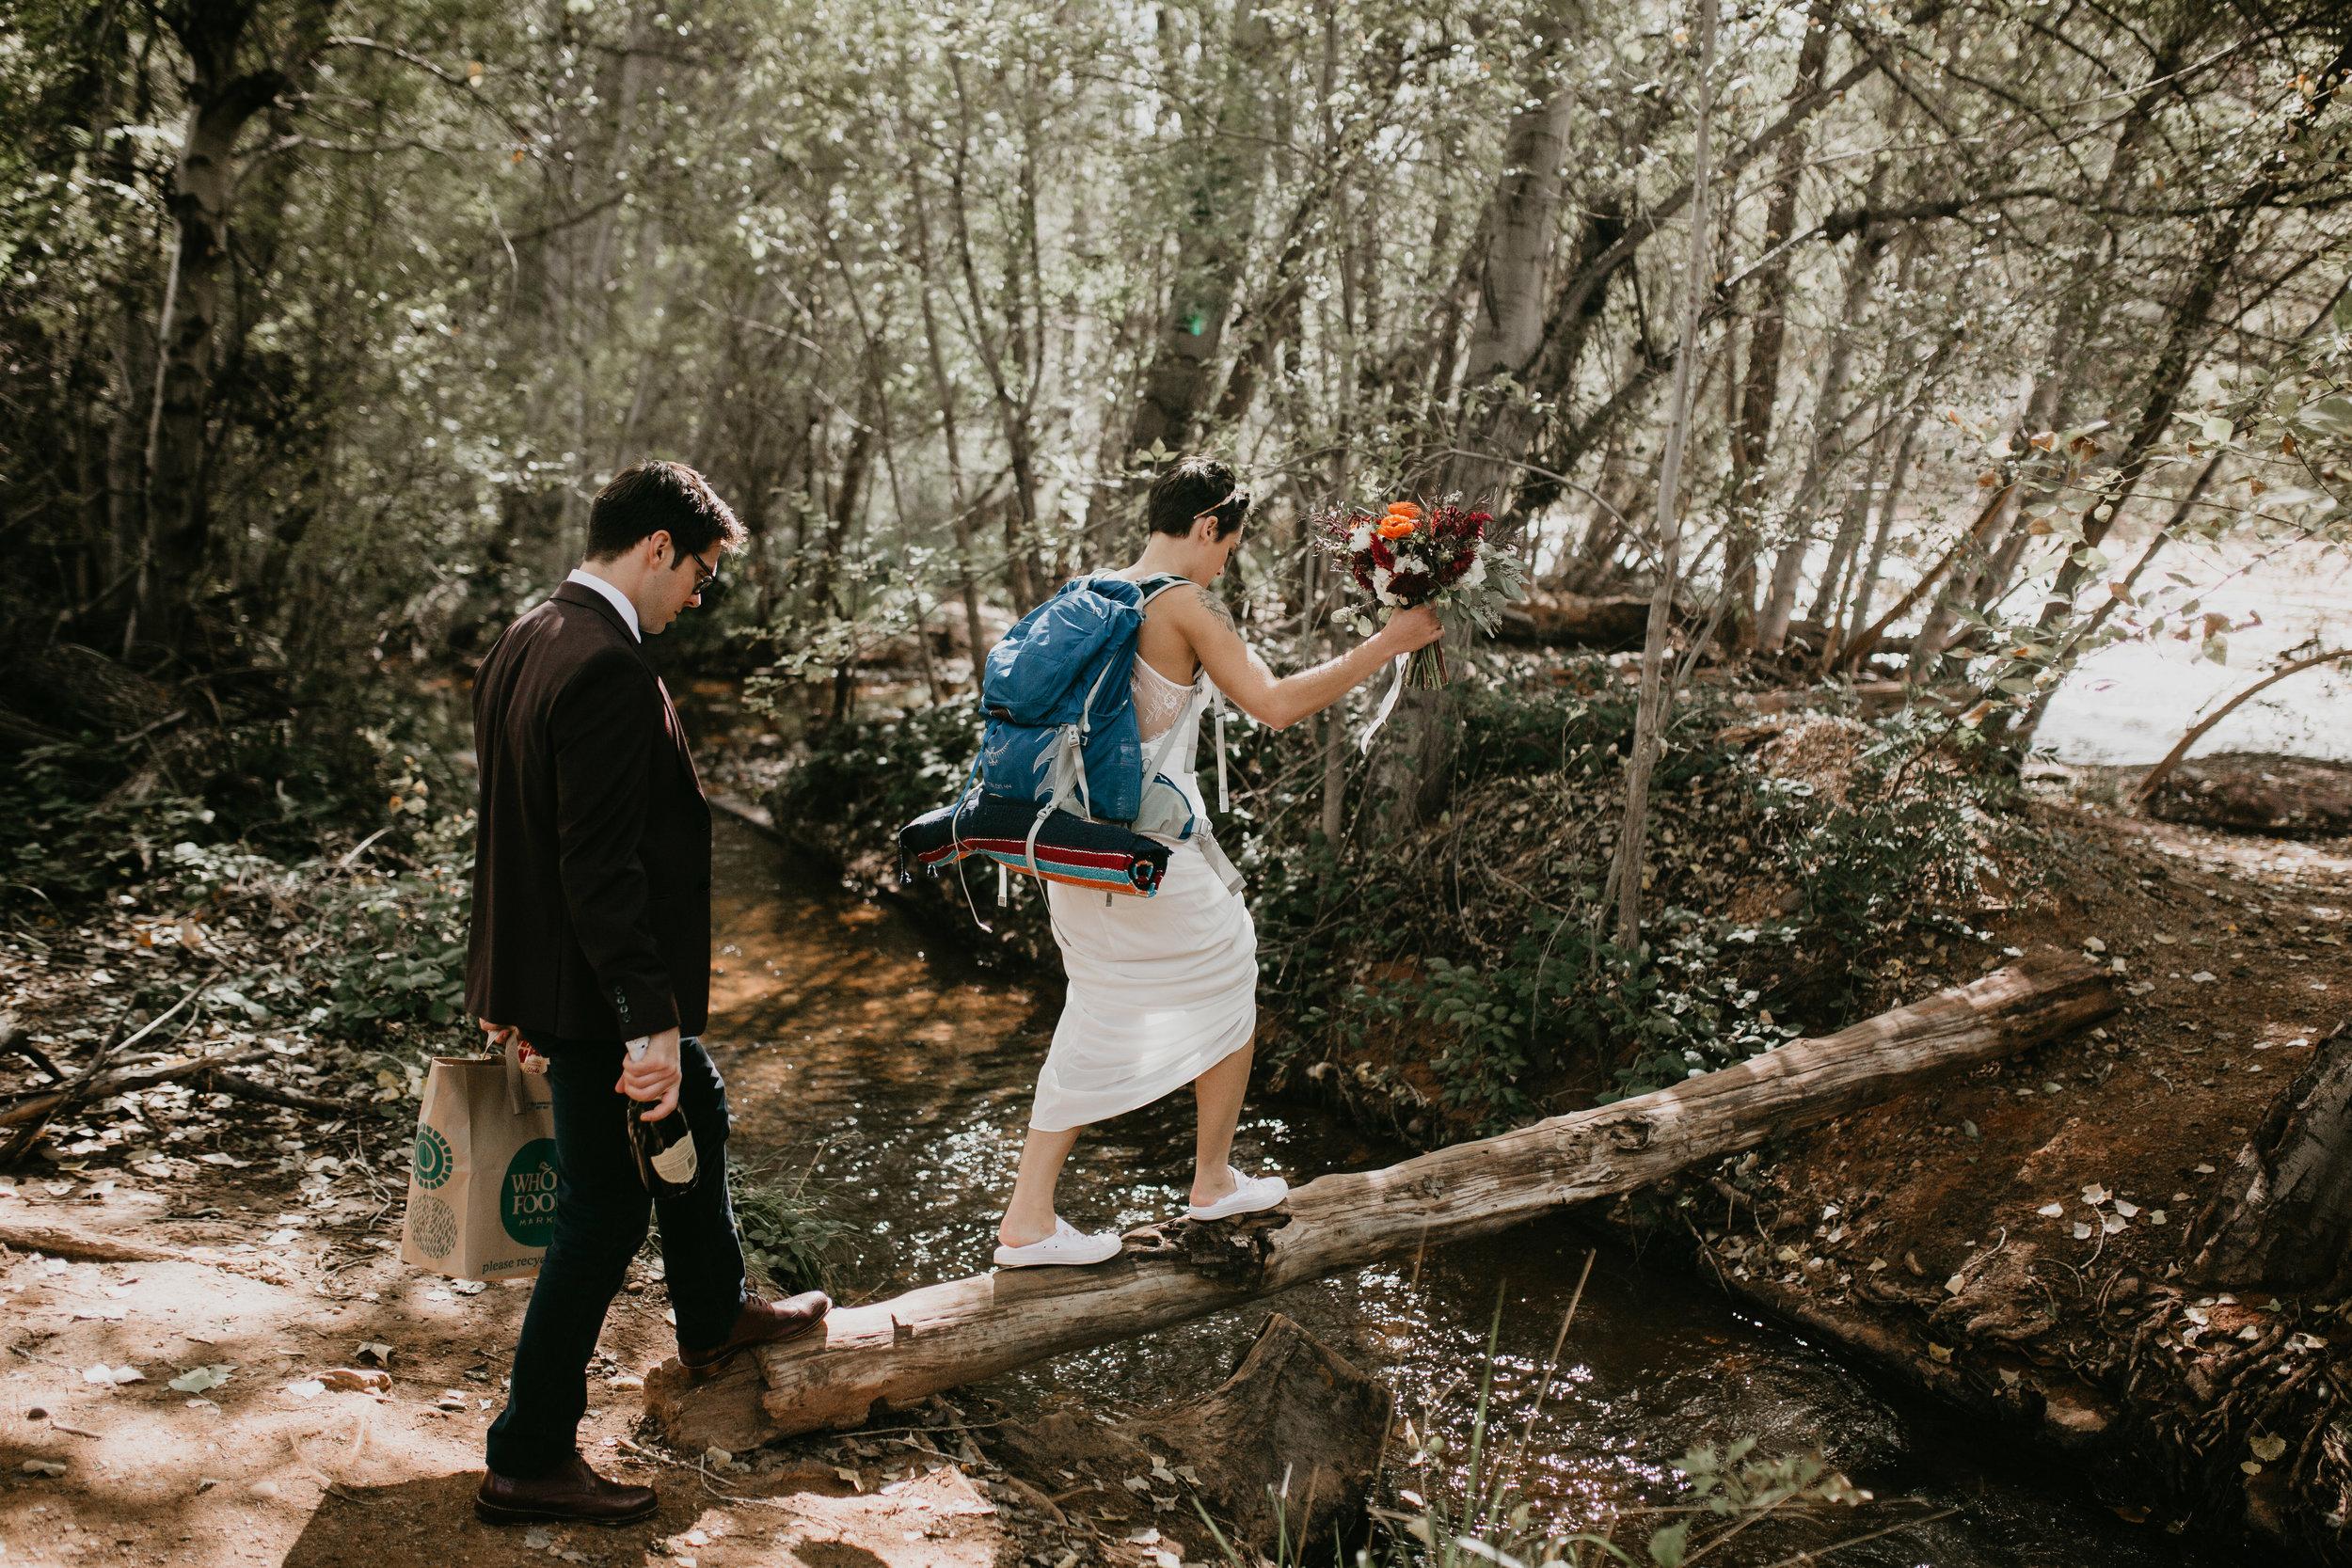 nicole-daacke-photography-sedona-arizona-destination-elopement-wedding-photographer-catherdral-rock-hiking-elopement-sedona-river-elopement-photos-desert-rock-wedding-photographer-laid-back-spontaneous-elopement-96.jpg